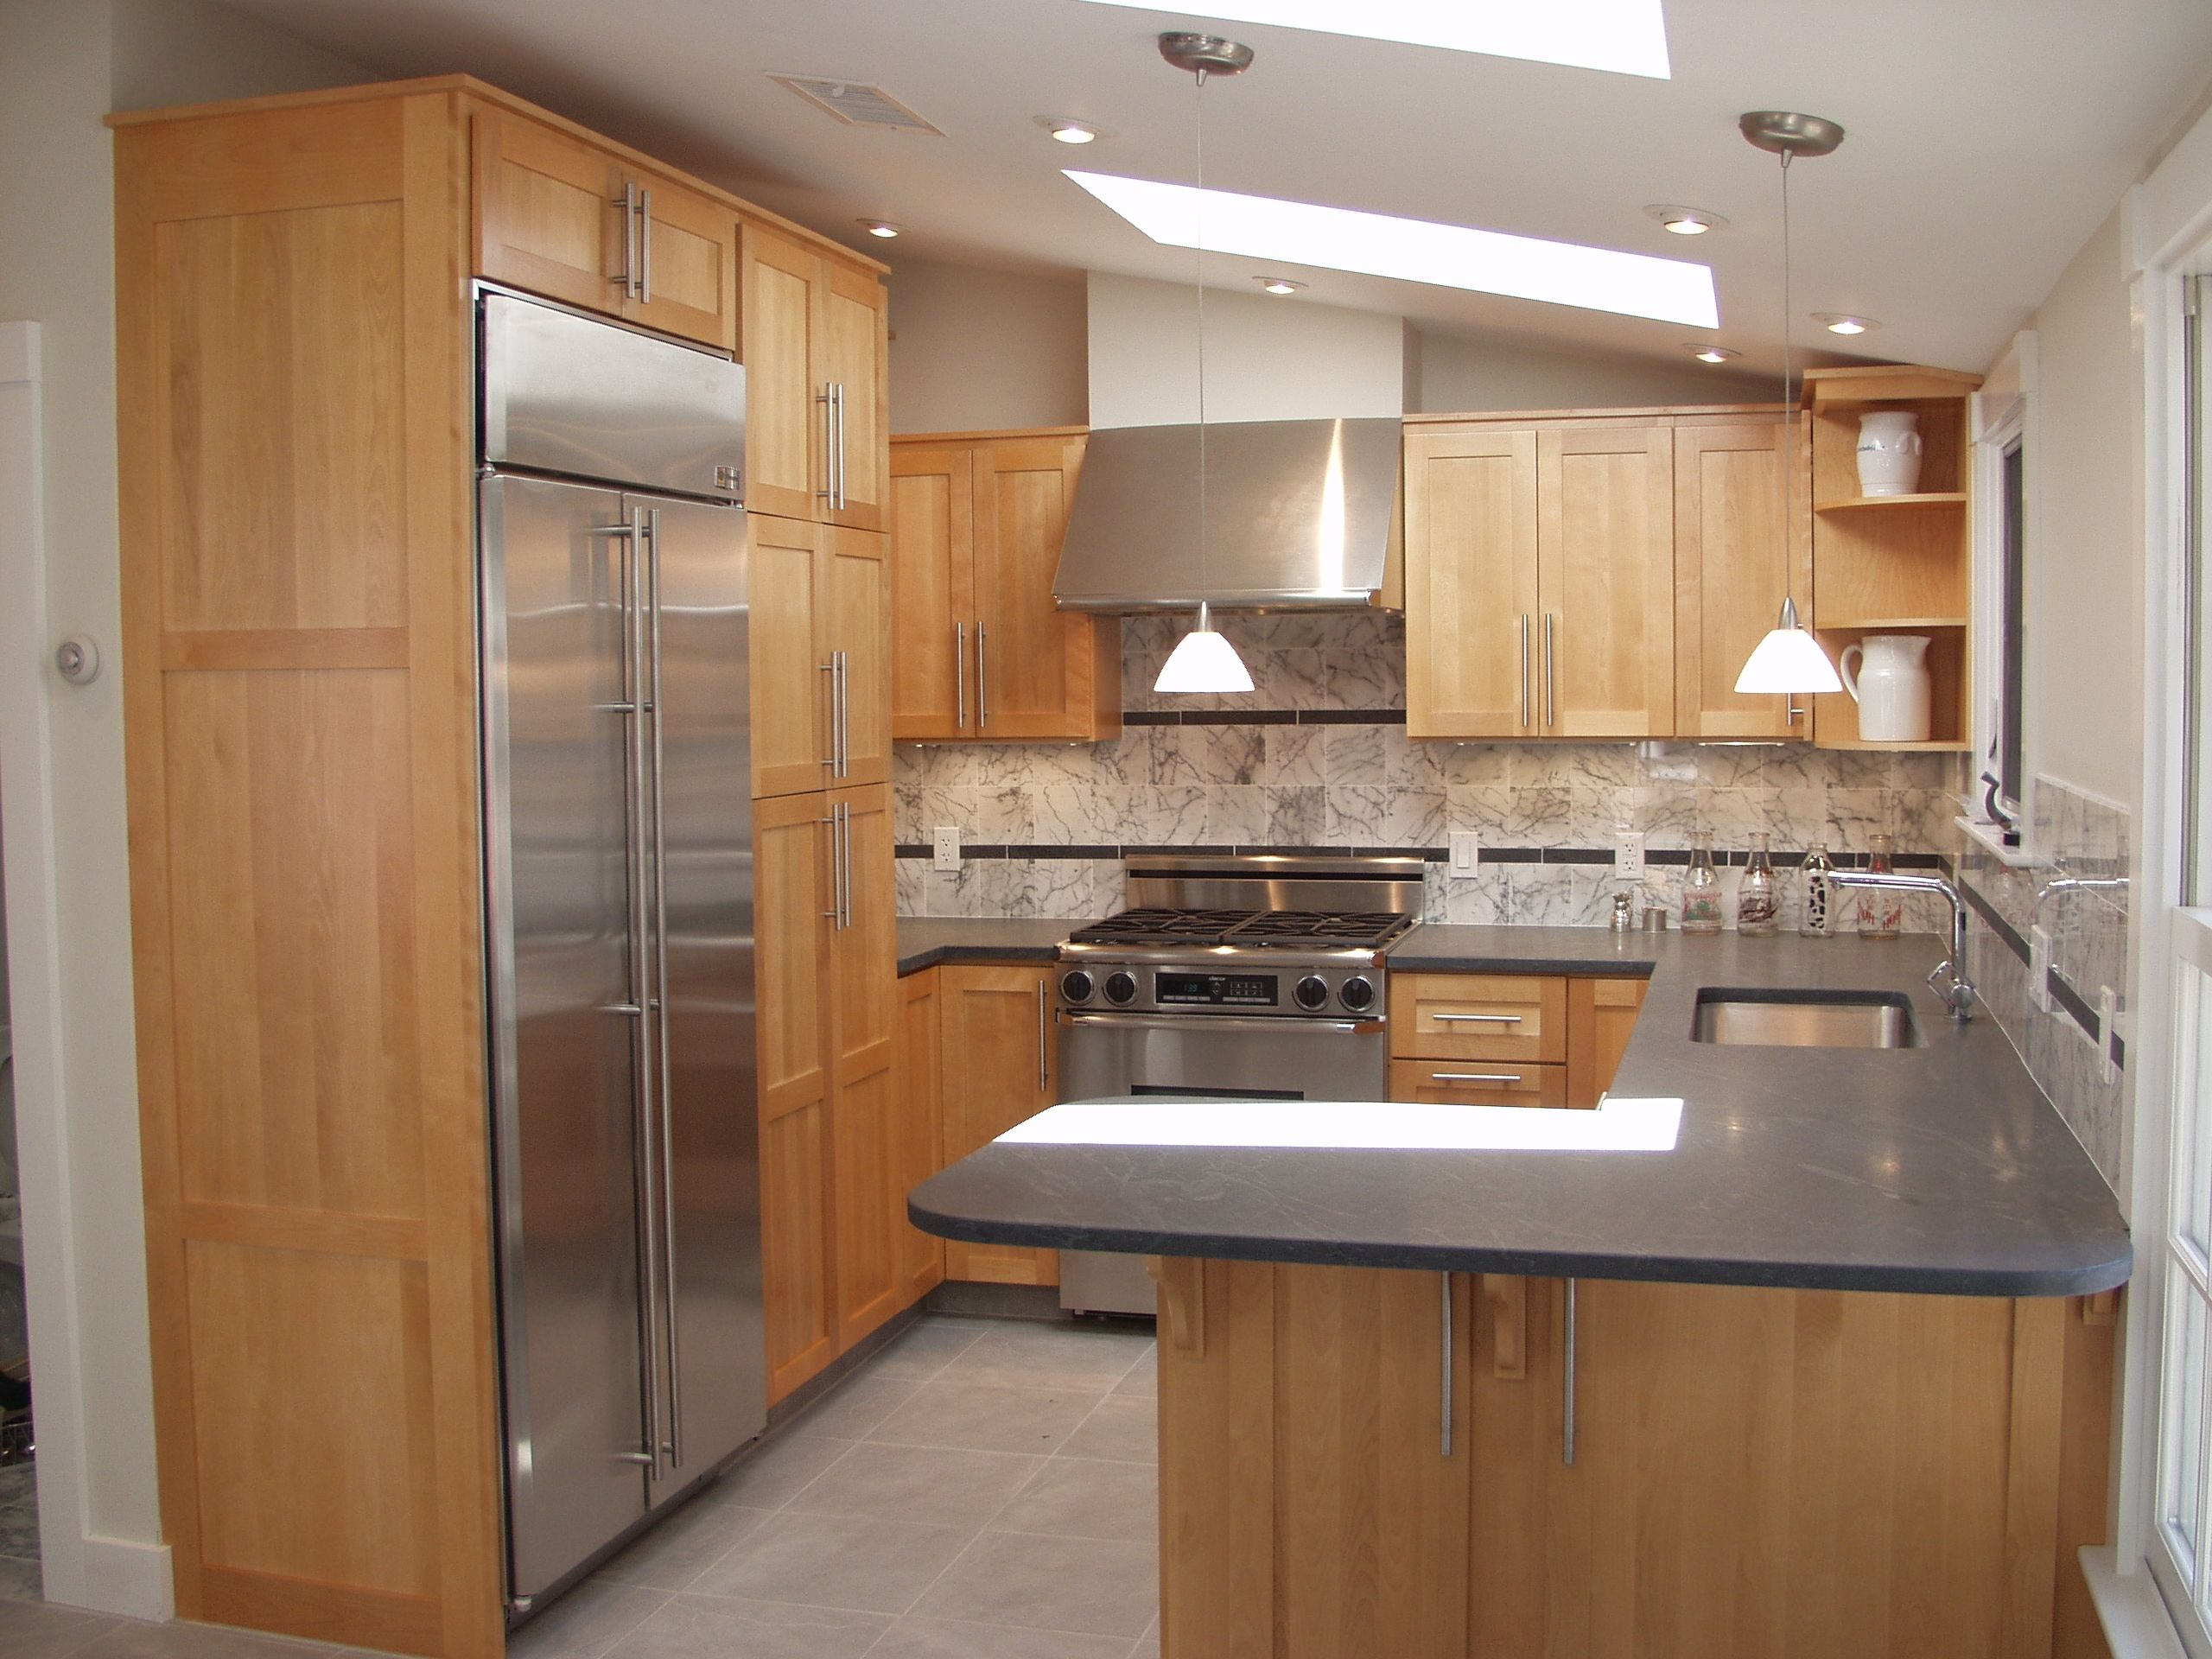 Red Birch Kitchen Cabinets Choose The Birch Kitchen Cabinets With Regard To Dimensions 2560 X 1920 Birch Kitchen Cabinets Craftsman Kitchen G Shaped Kitchen